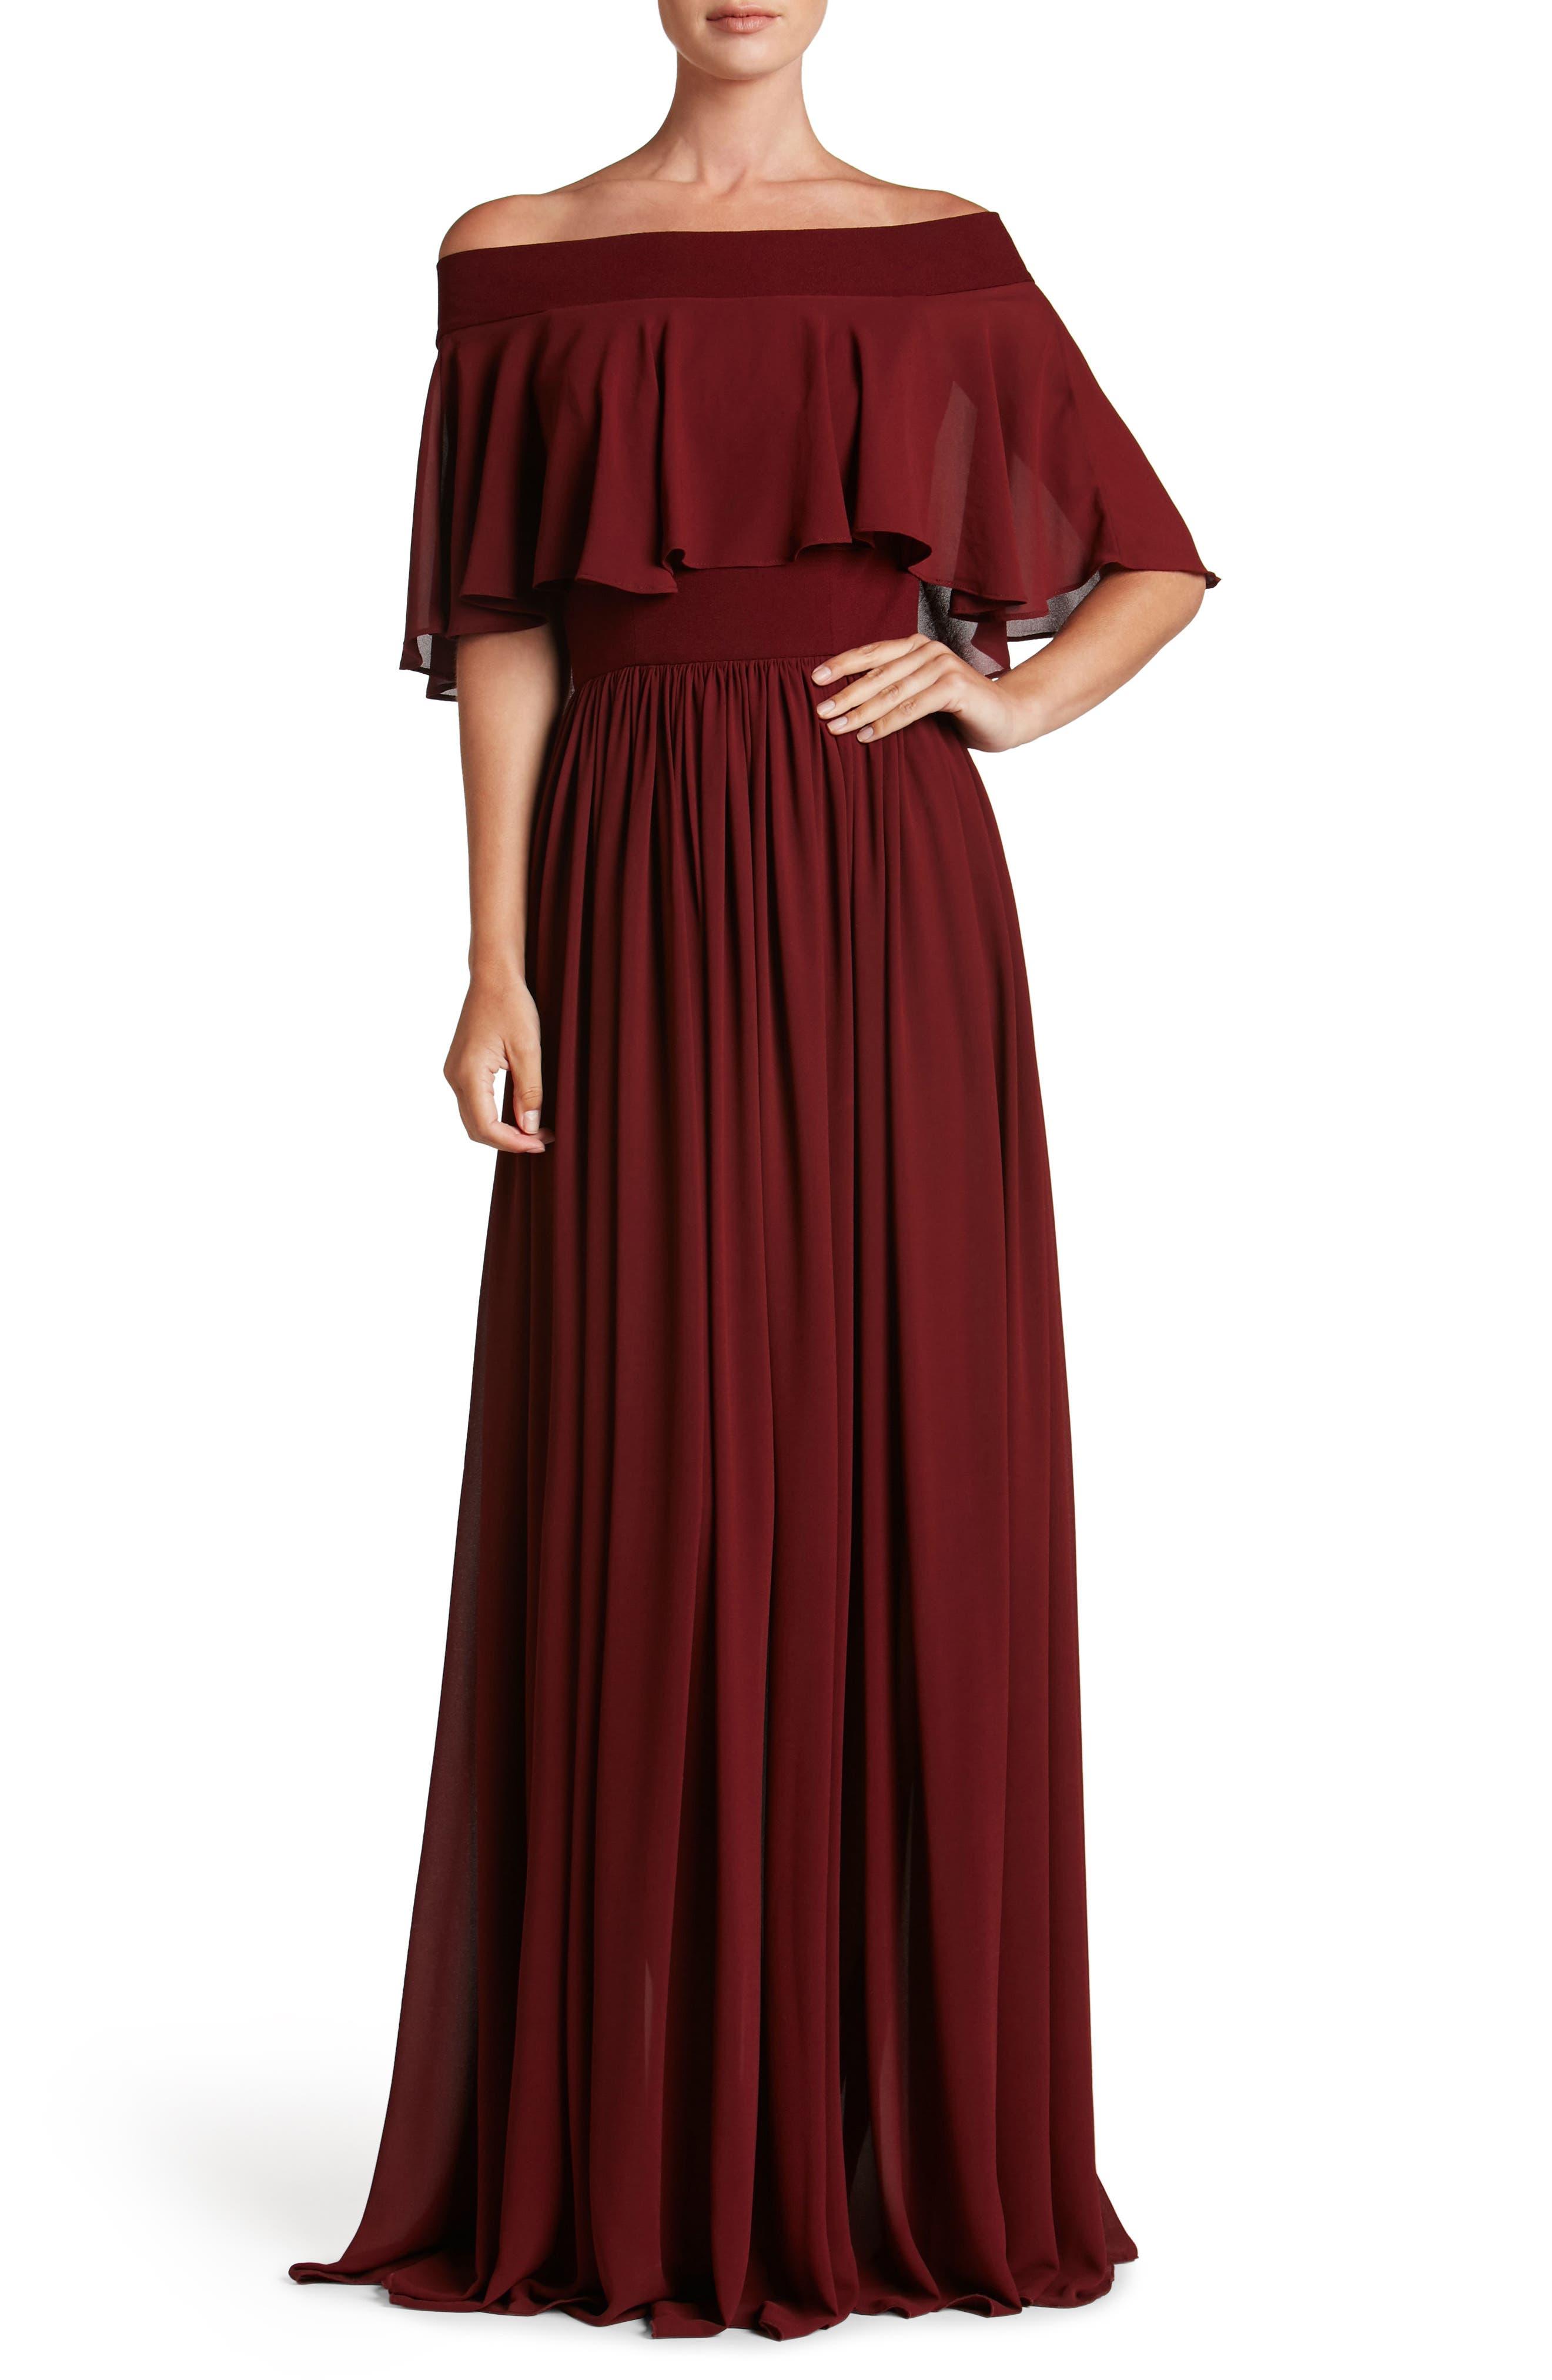 Violet Off the Shoulder Chiffon Gown,                         Main,                         color, Burgundy